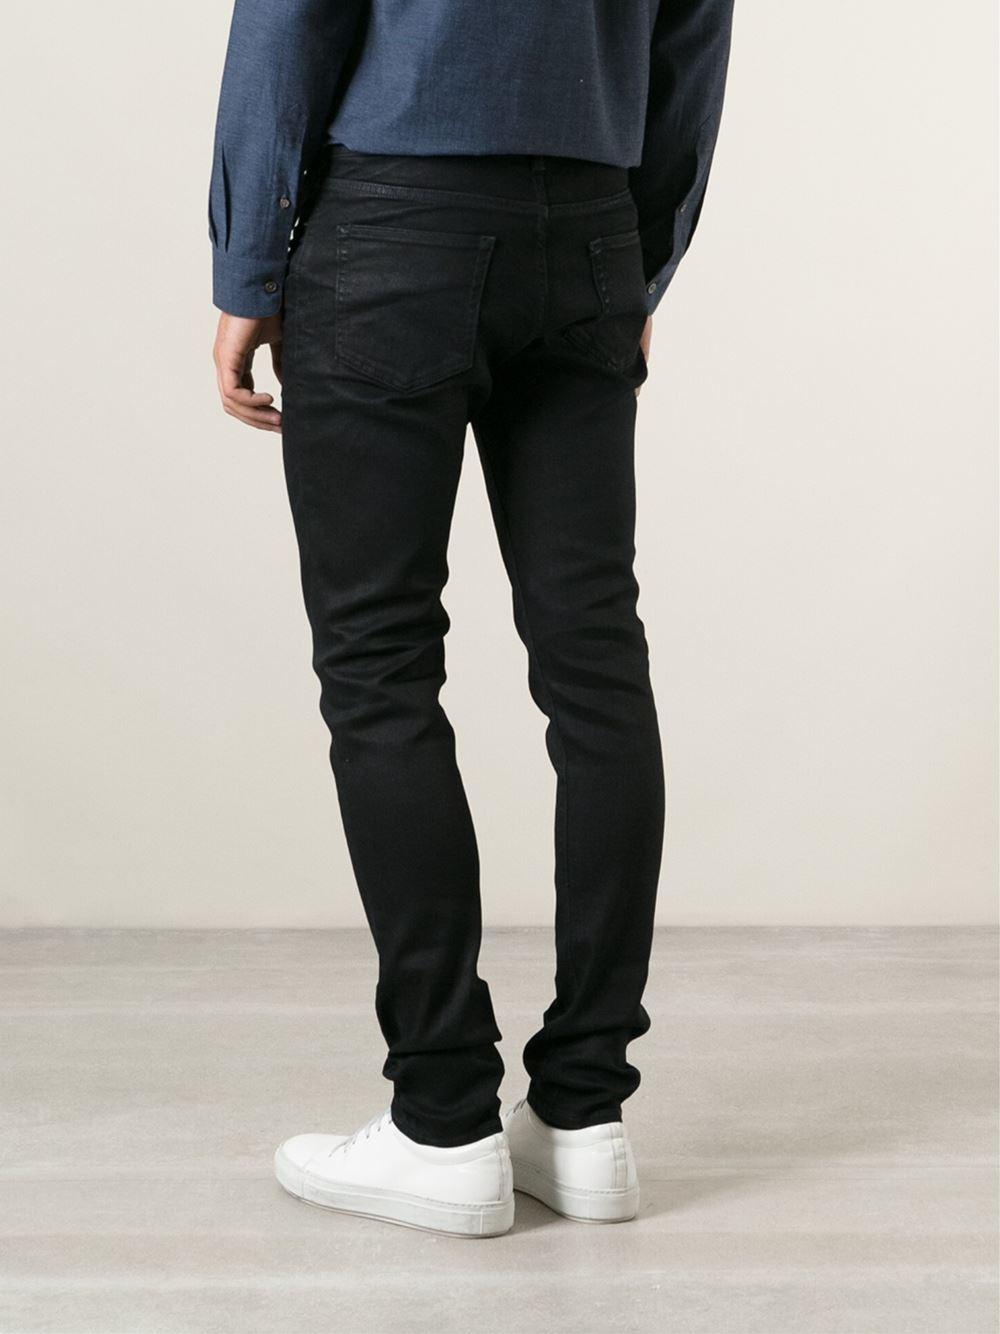 Lyst - Acne Studios  Thin Dawn  Jeans in Black for Men b5df8d036c5